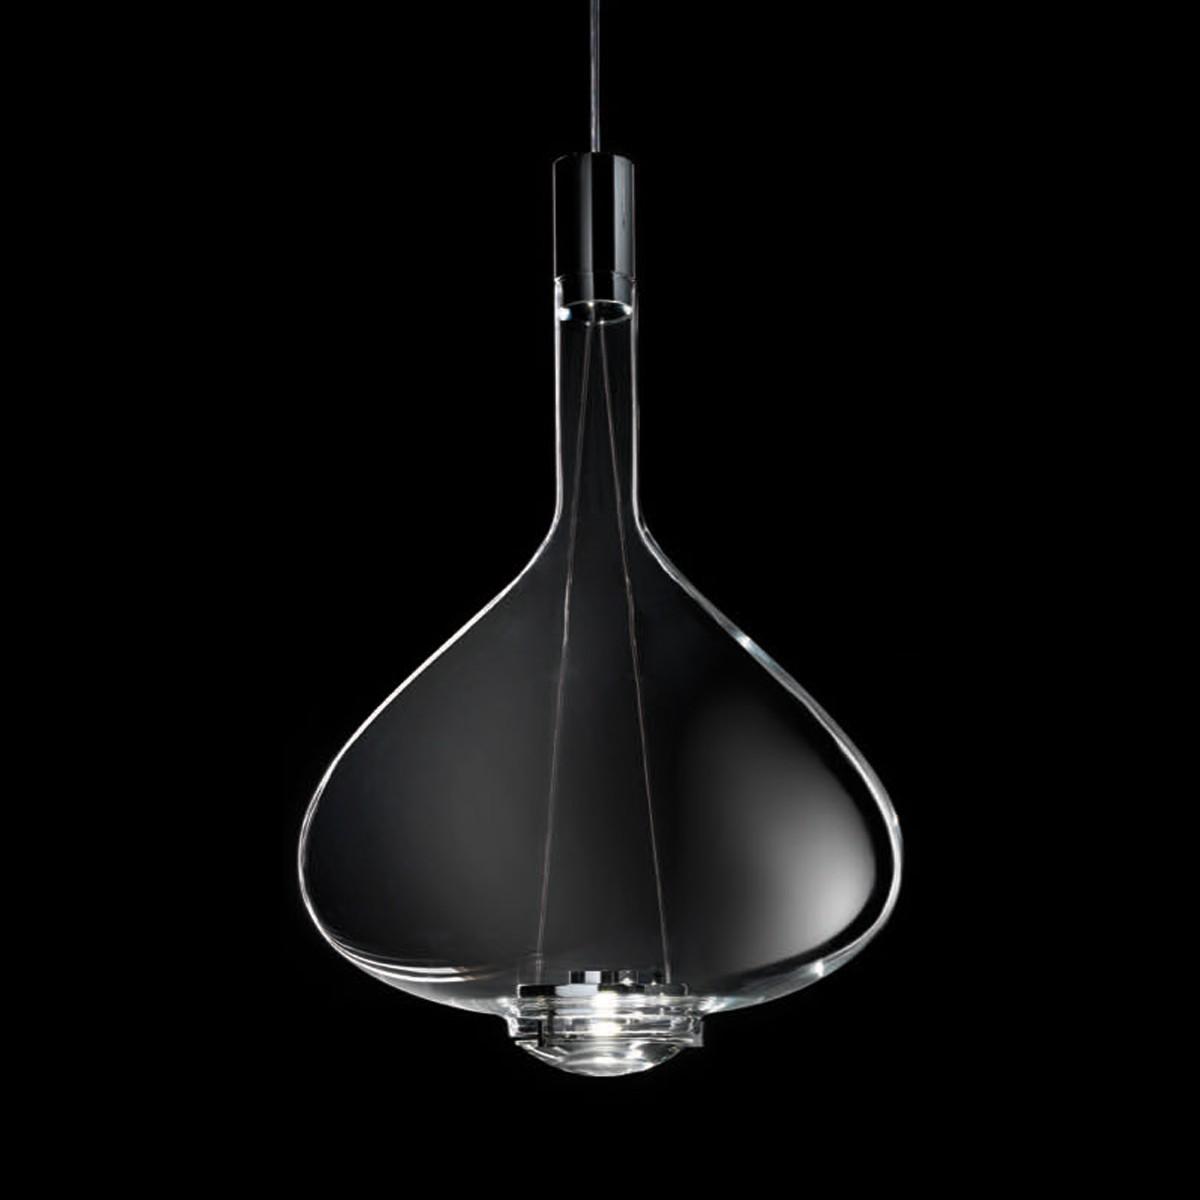 Studio Italia Design Sky-Fall Large Pendelleuchte, Chrom / Kristallglas